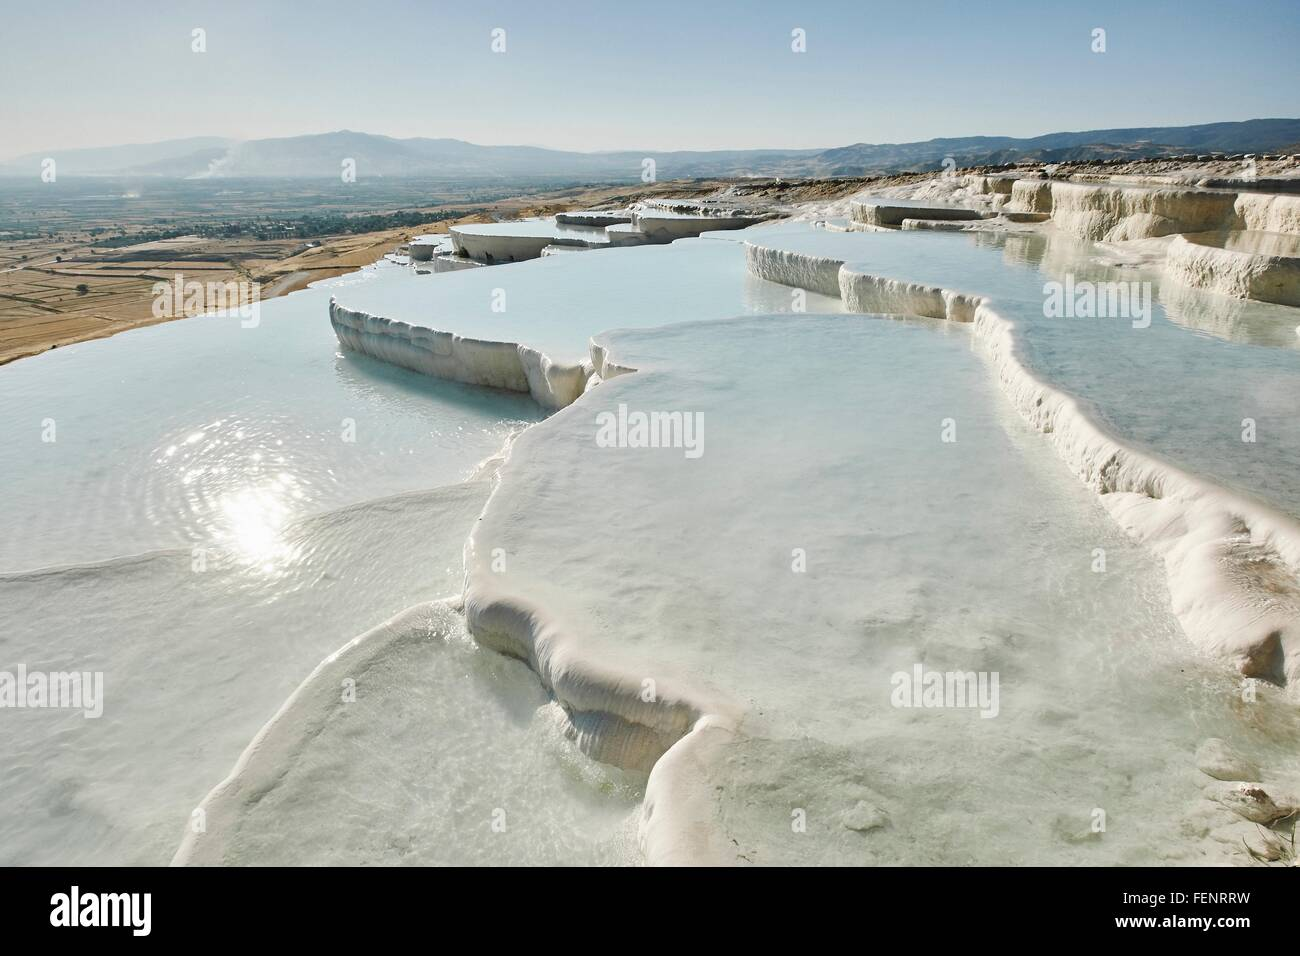 White Hot spring terrasses, Pamukkale, Anatolie, Turquie Photo Stock